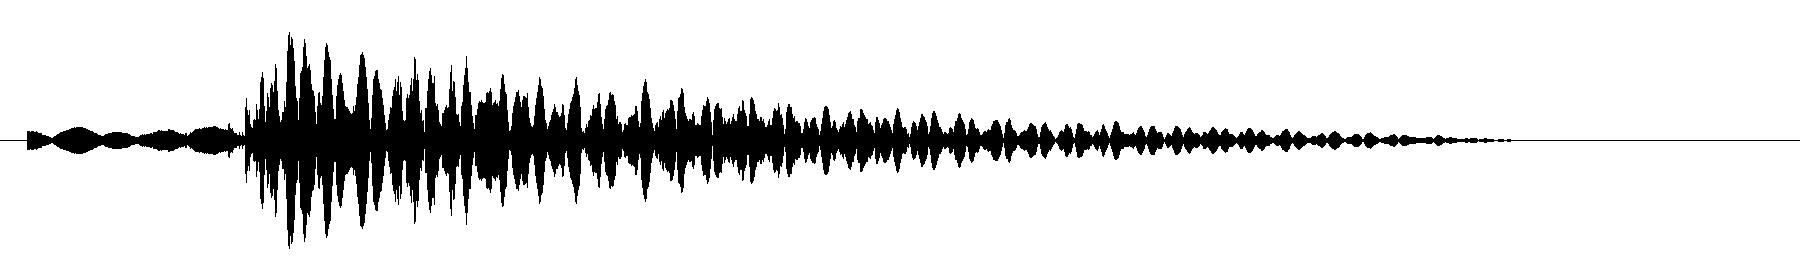 perc 1 19